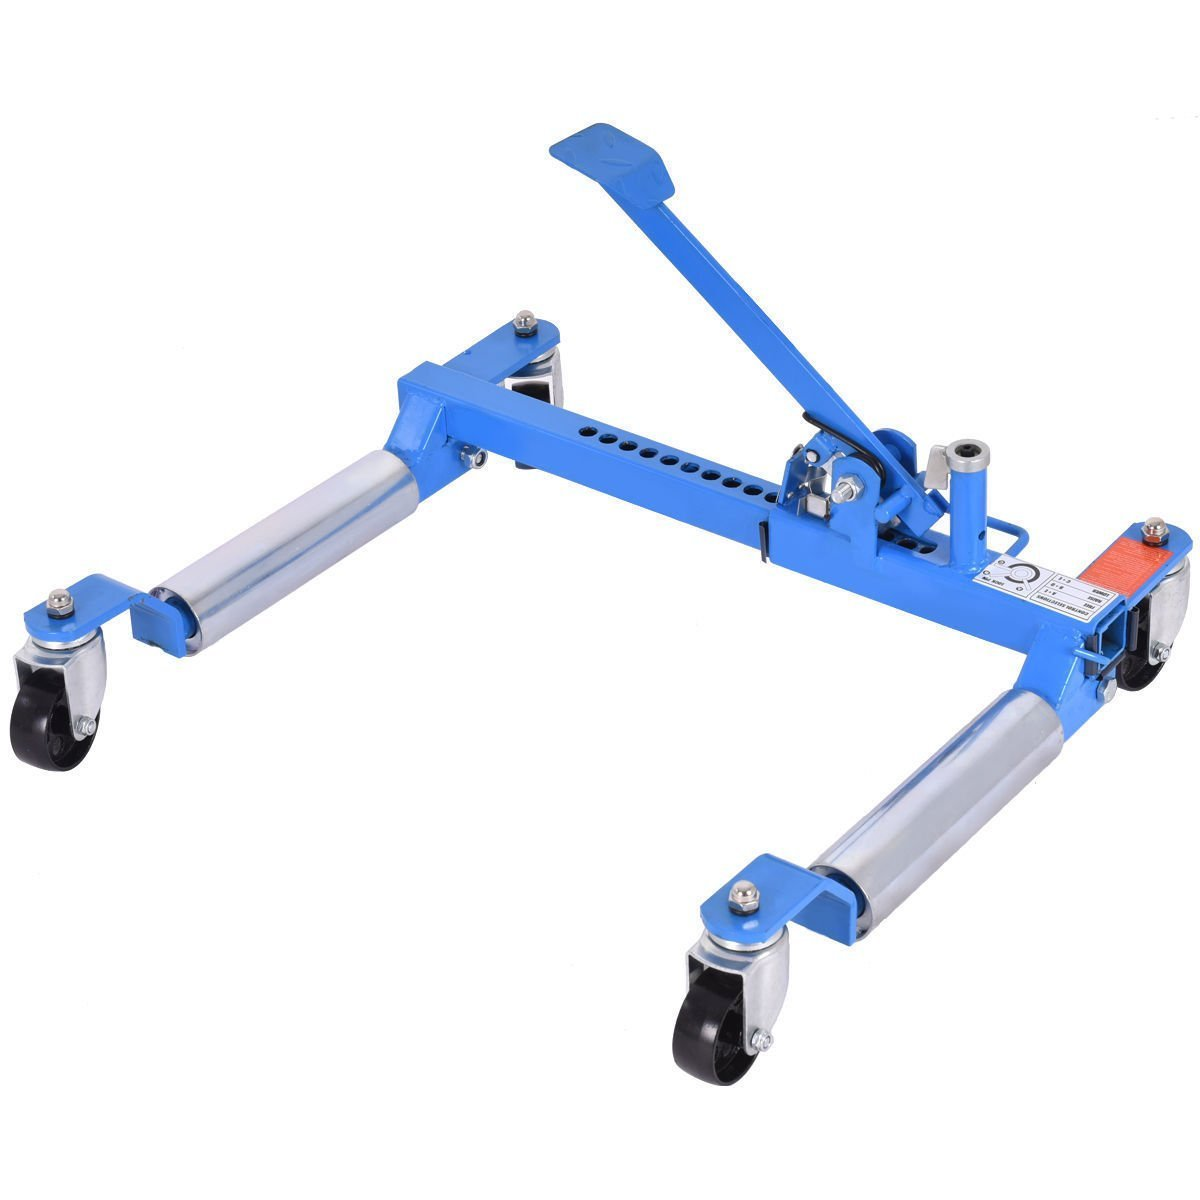 Goplus Wheel Dolly Car Skates Vehicle Positioning Hydraulic Tire Jack, 1250 lb (Blue)